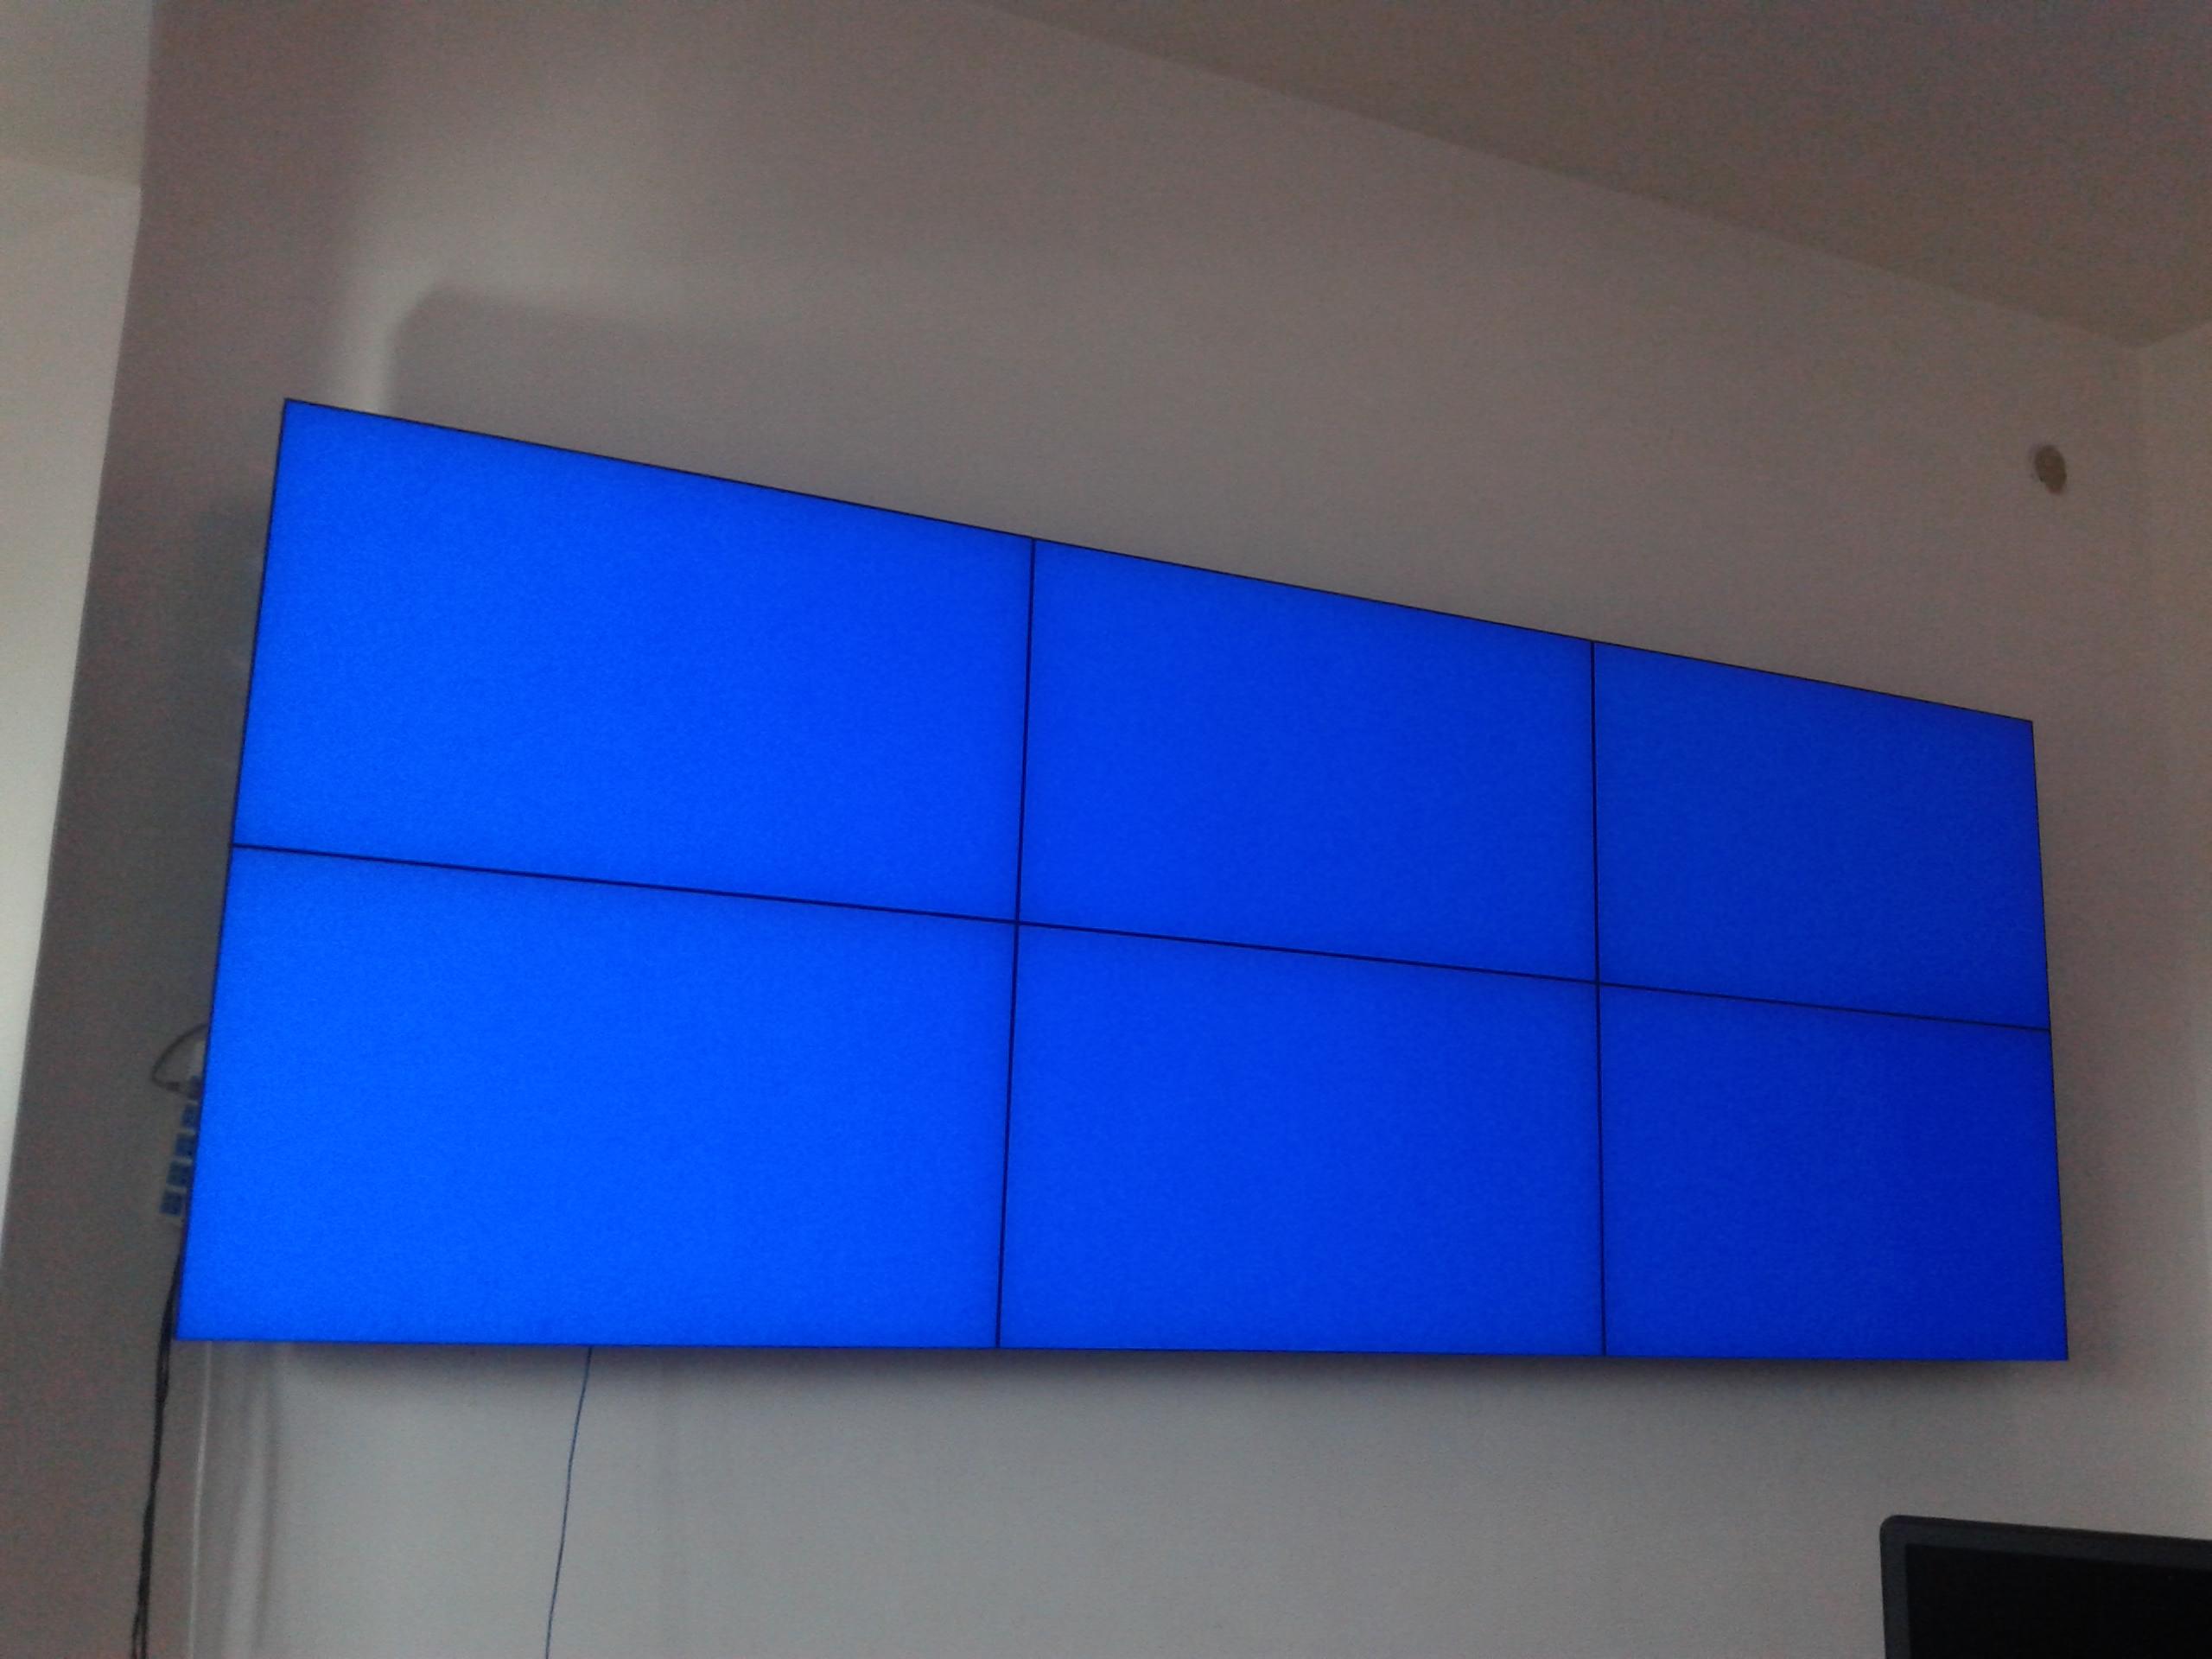 uc板材墙体效果图